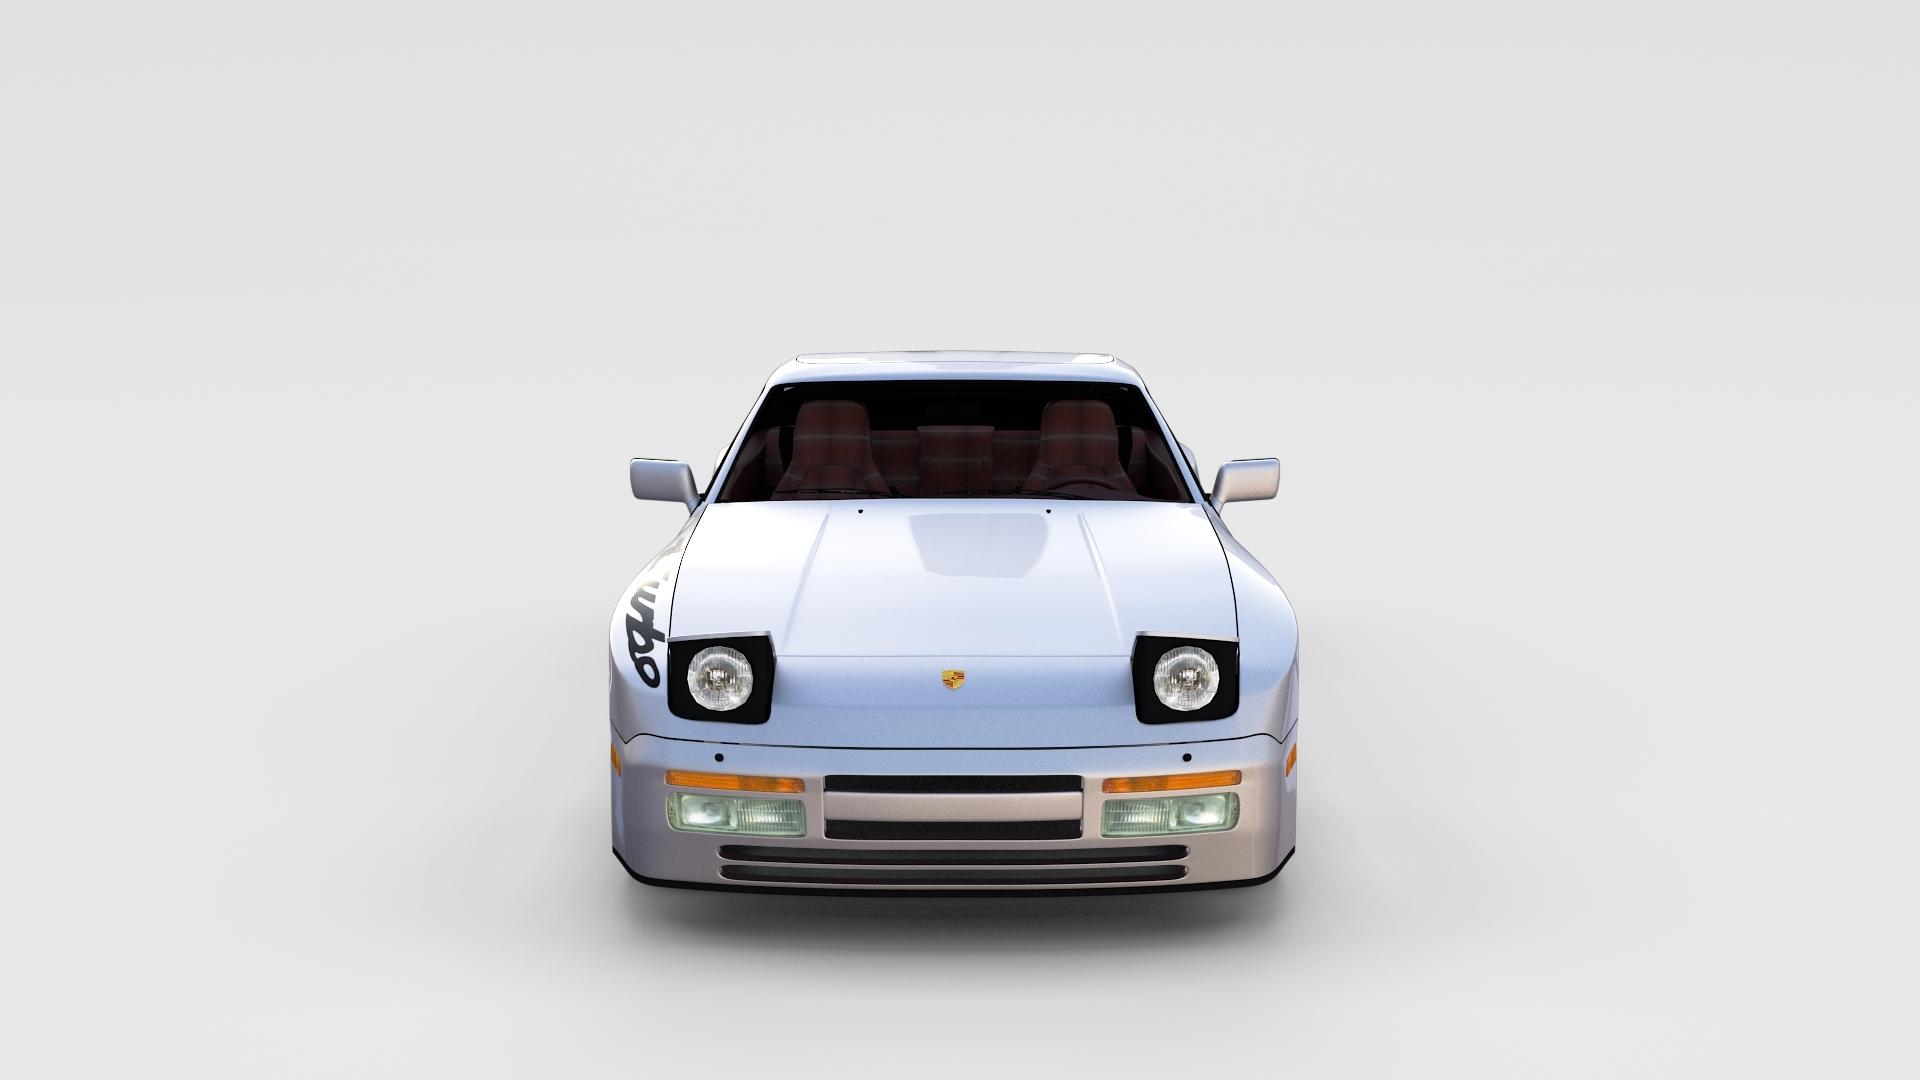 Porsche 944 Turbo S With Interior Rev 3d Model